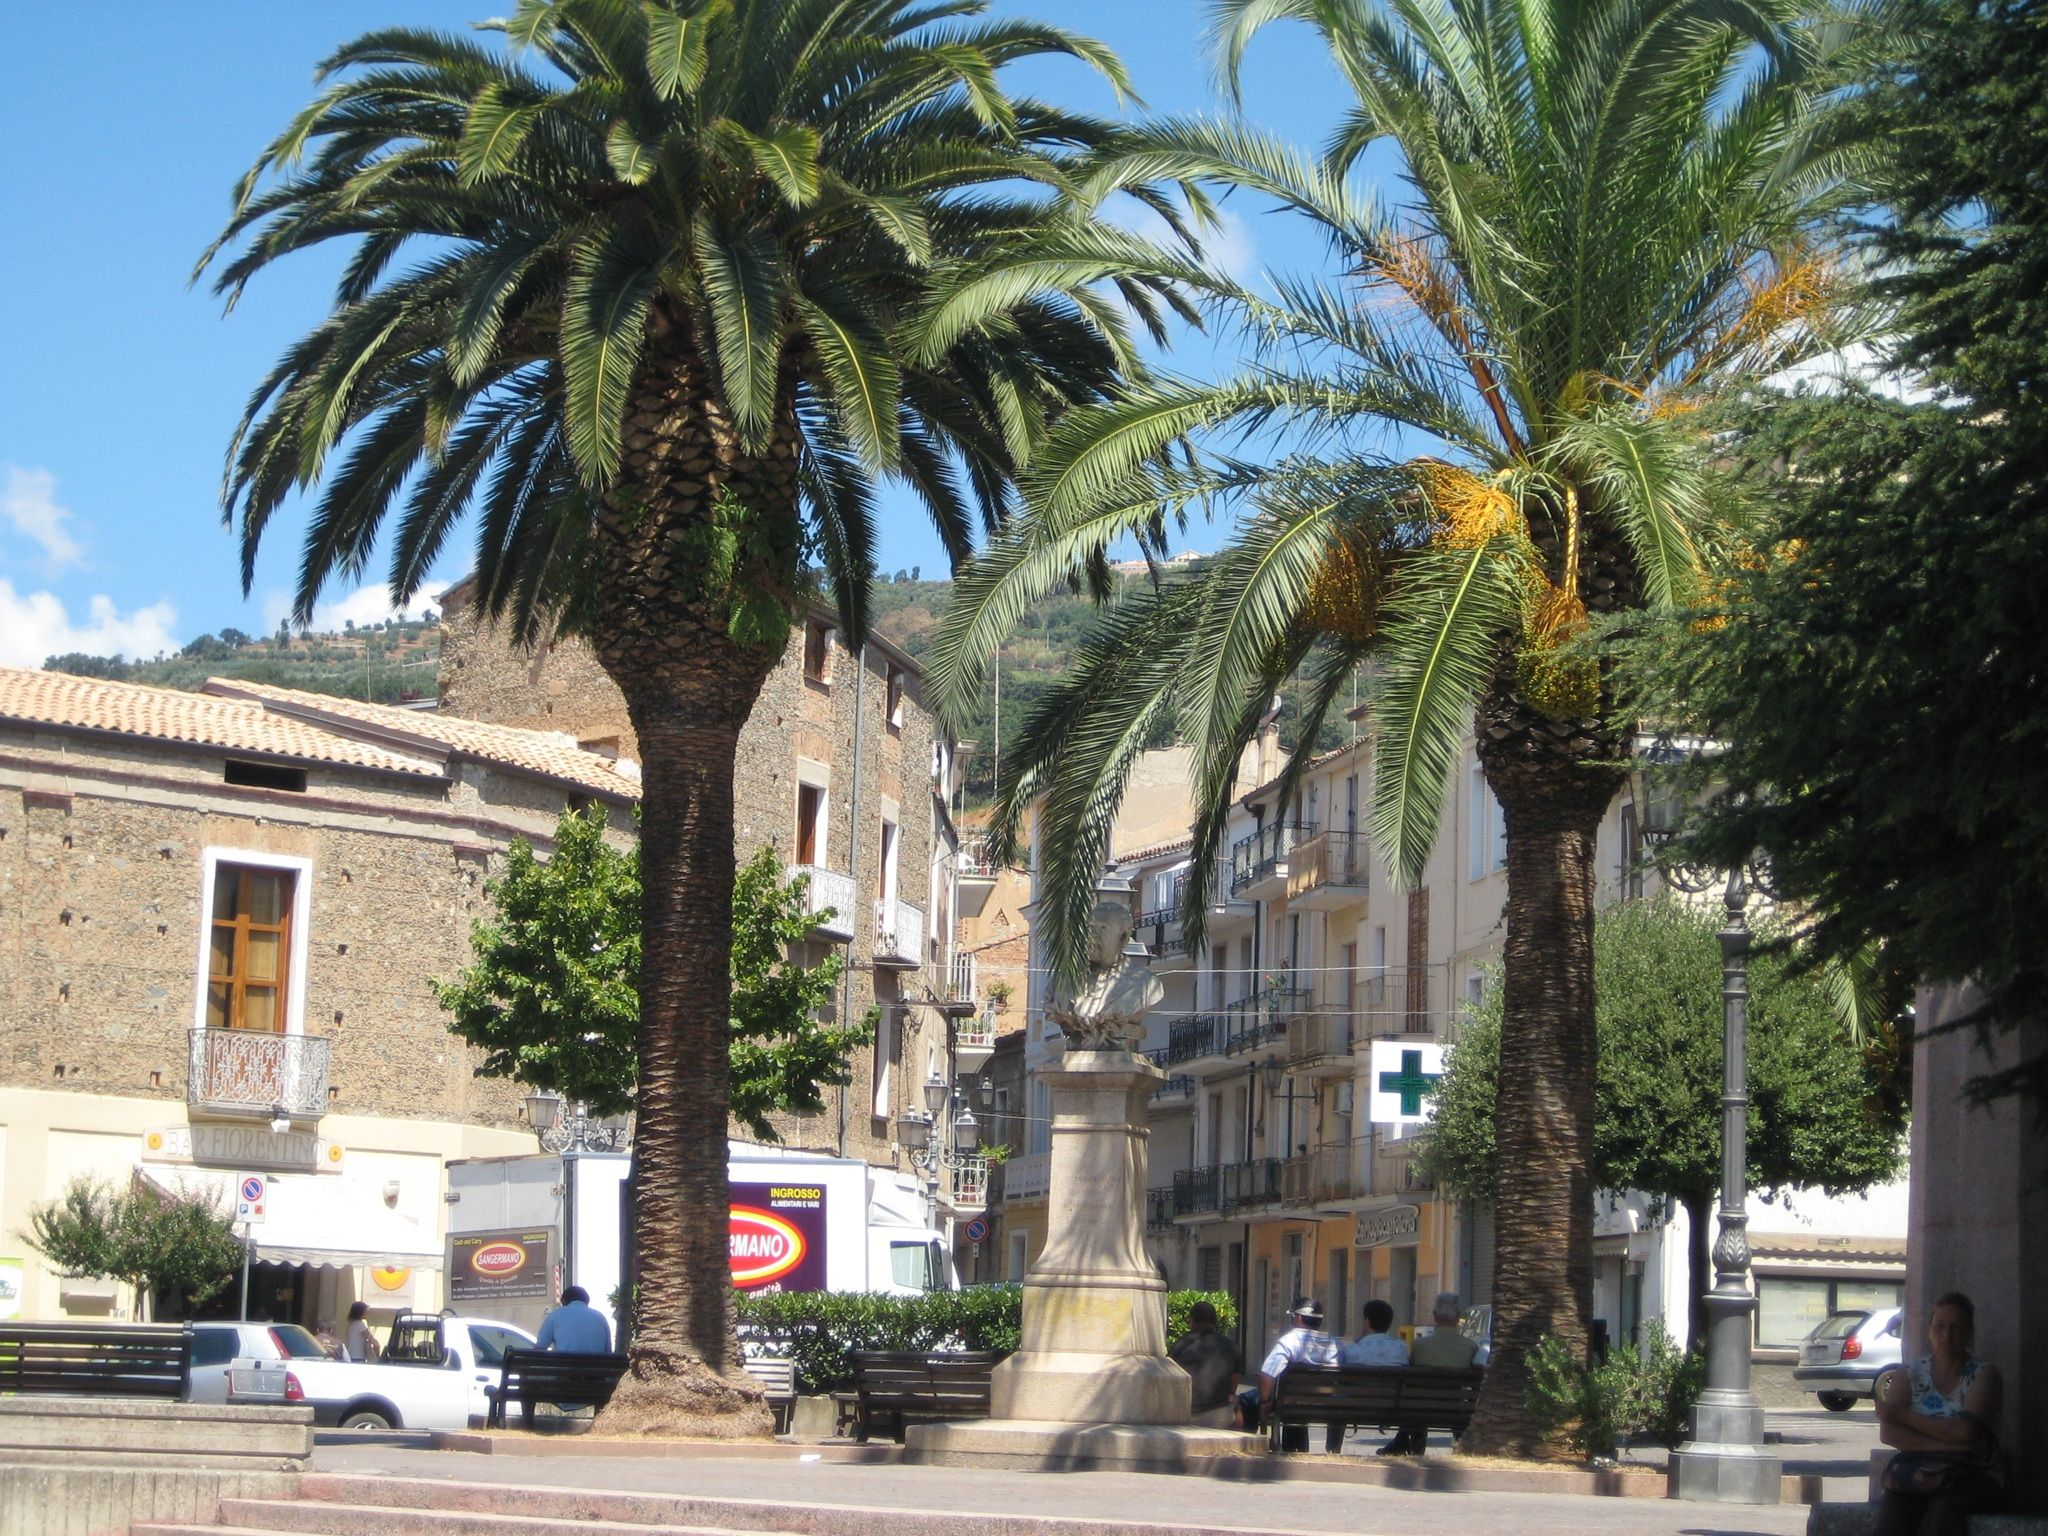 Piazza Fiorentino - Lamezia Terme Sambiase - Calabria One ...